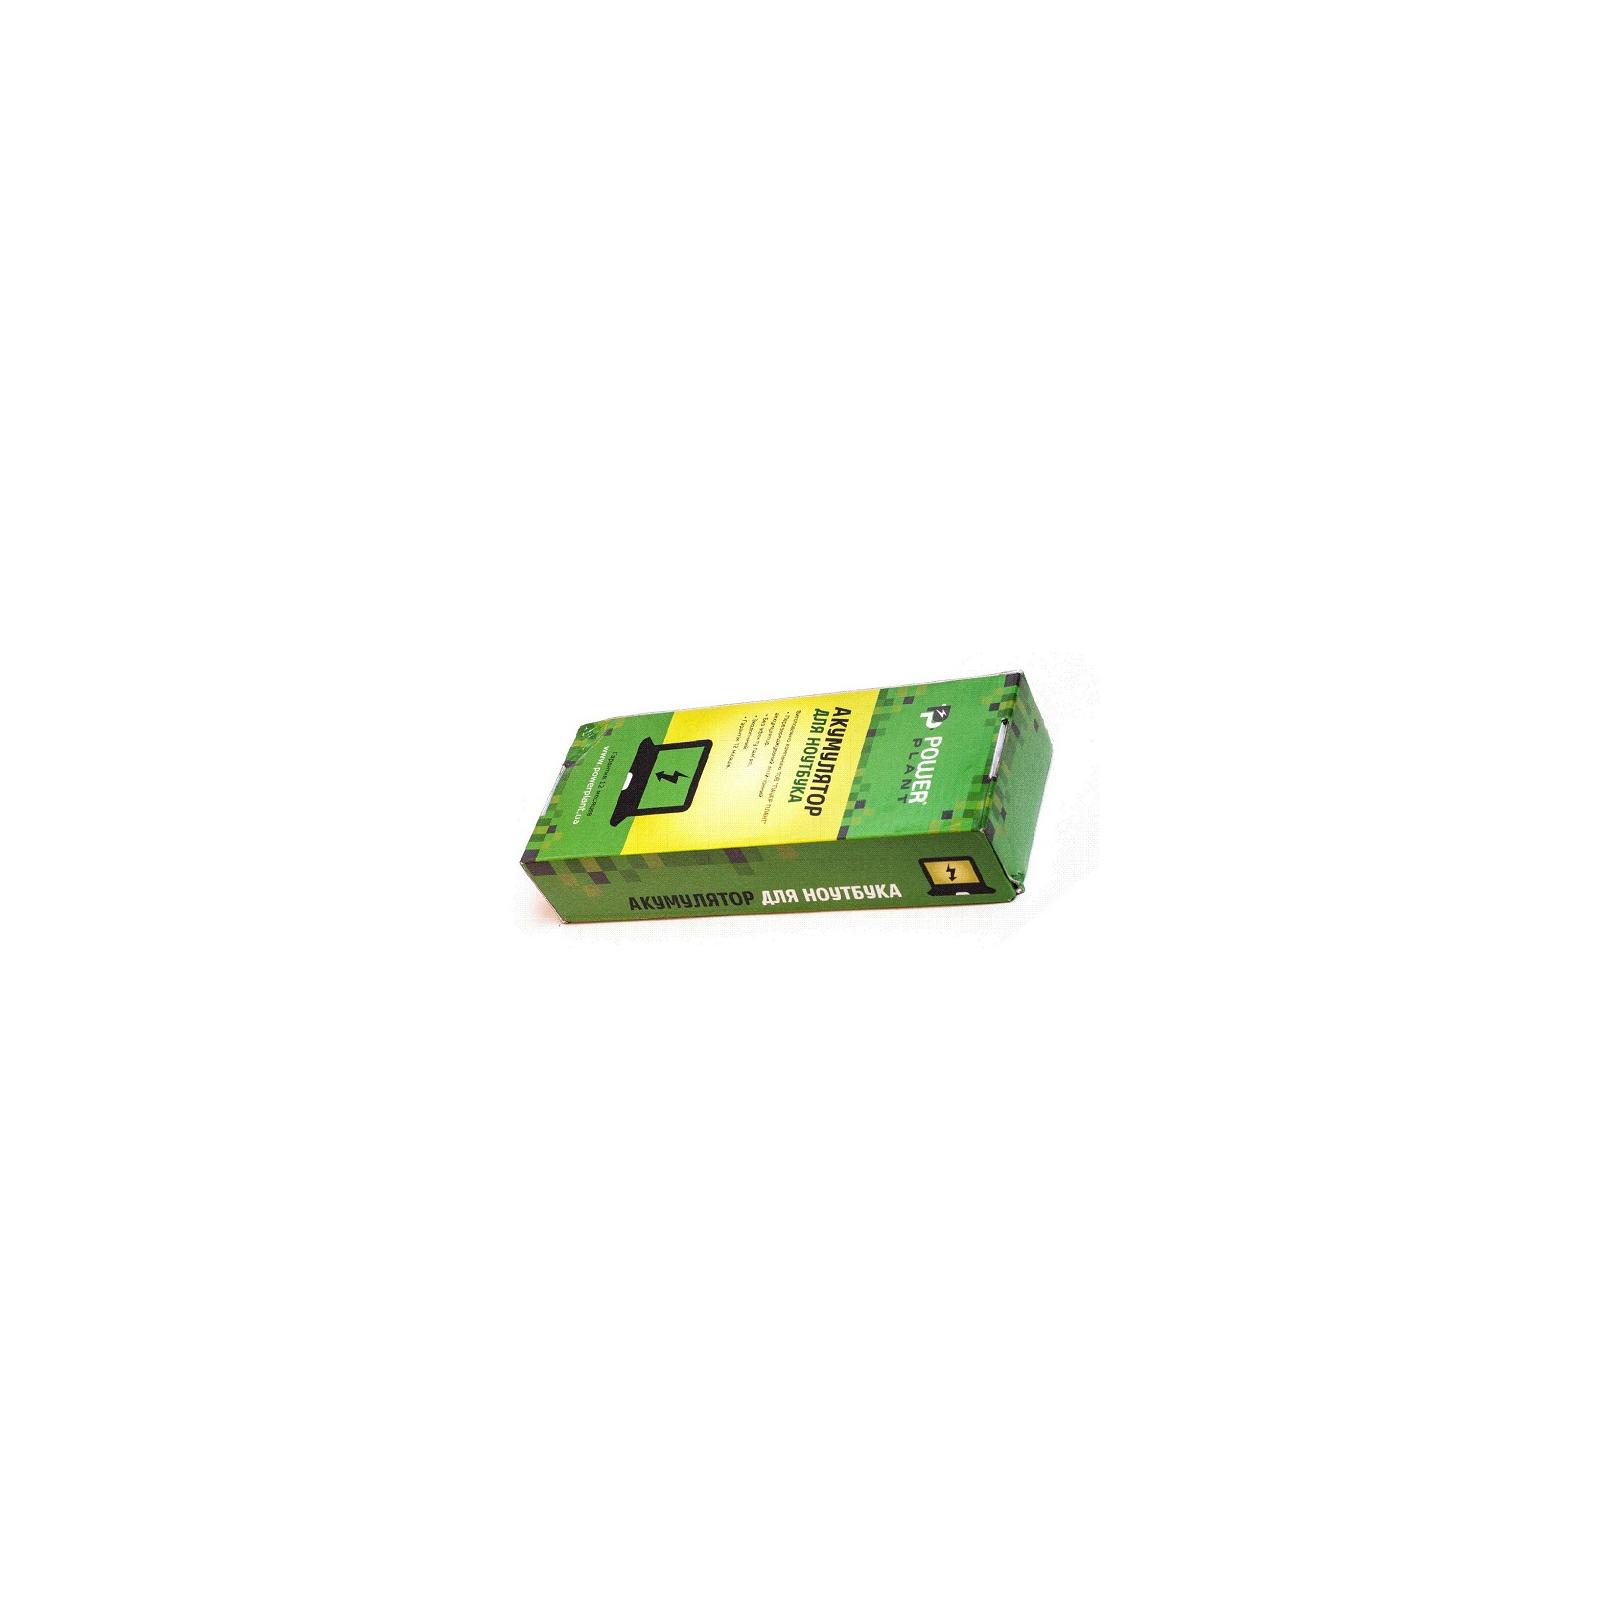 Аккумулятор для ноутбука DELL Vostro 1310 (N956C, DL1310LH) 11.1V 5200mAh PowerPlant (NB00000073) изображение 3